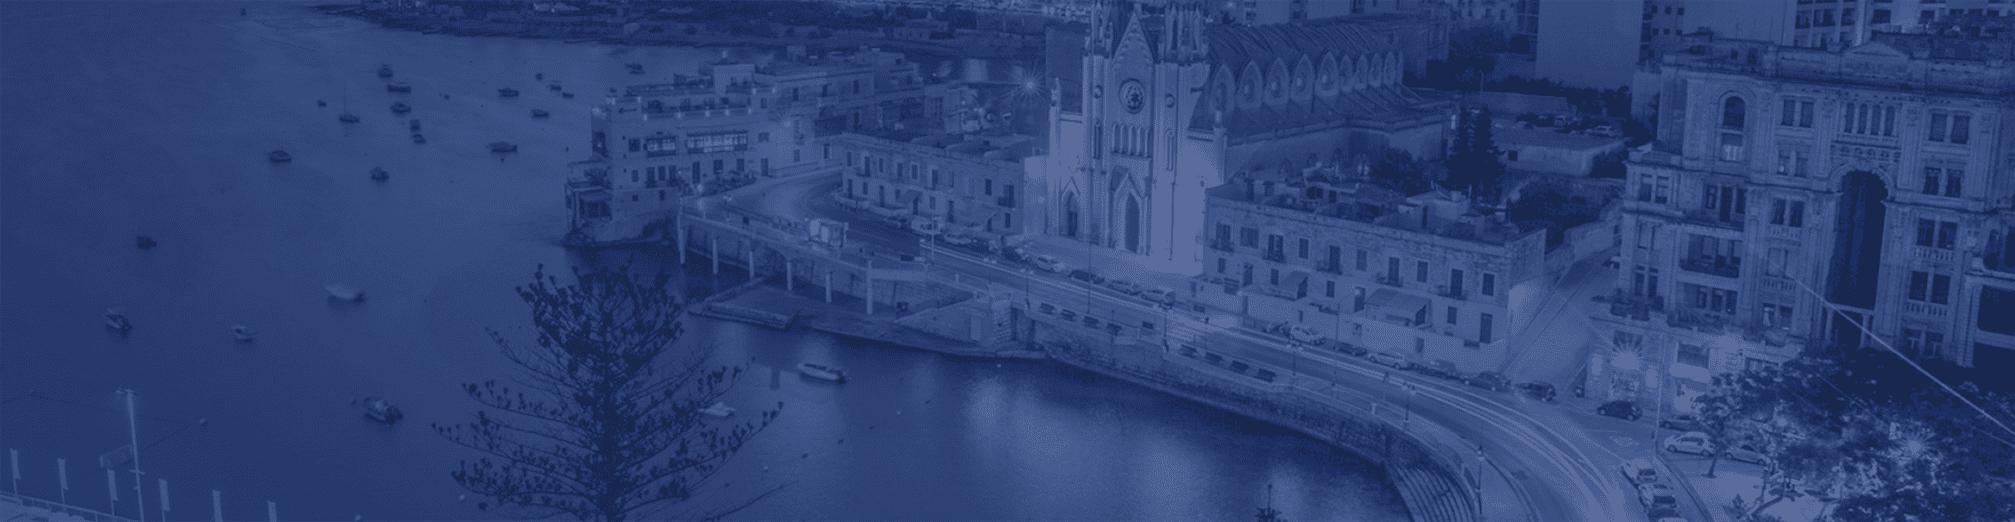 KSi Malta